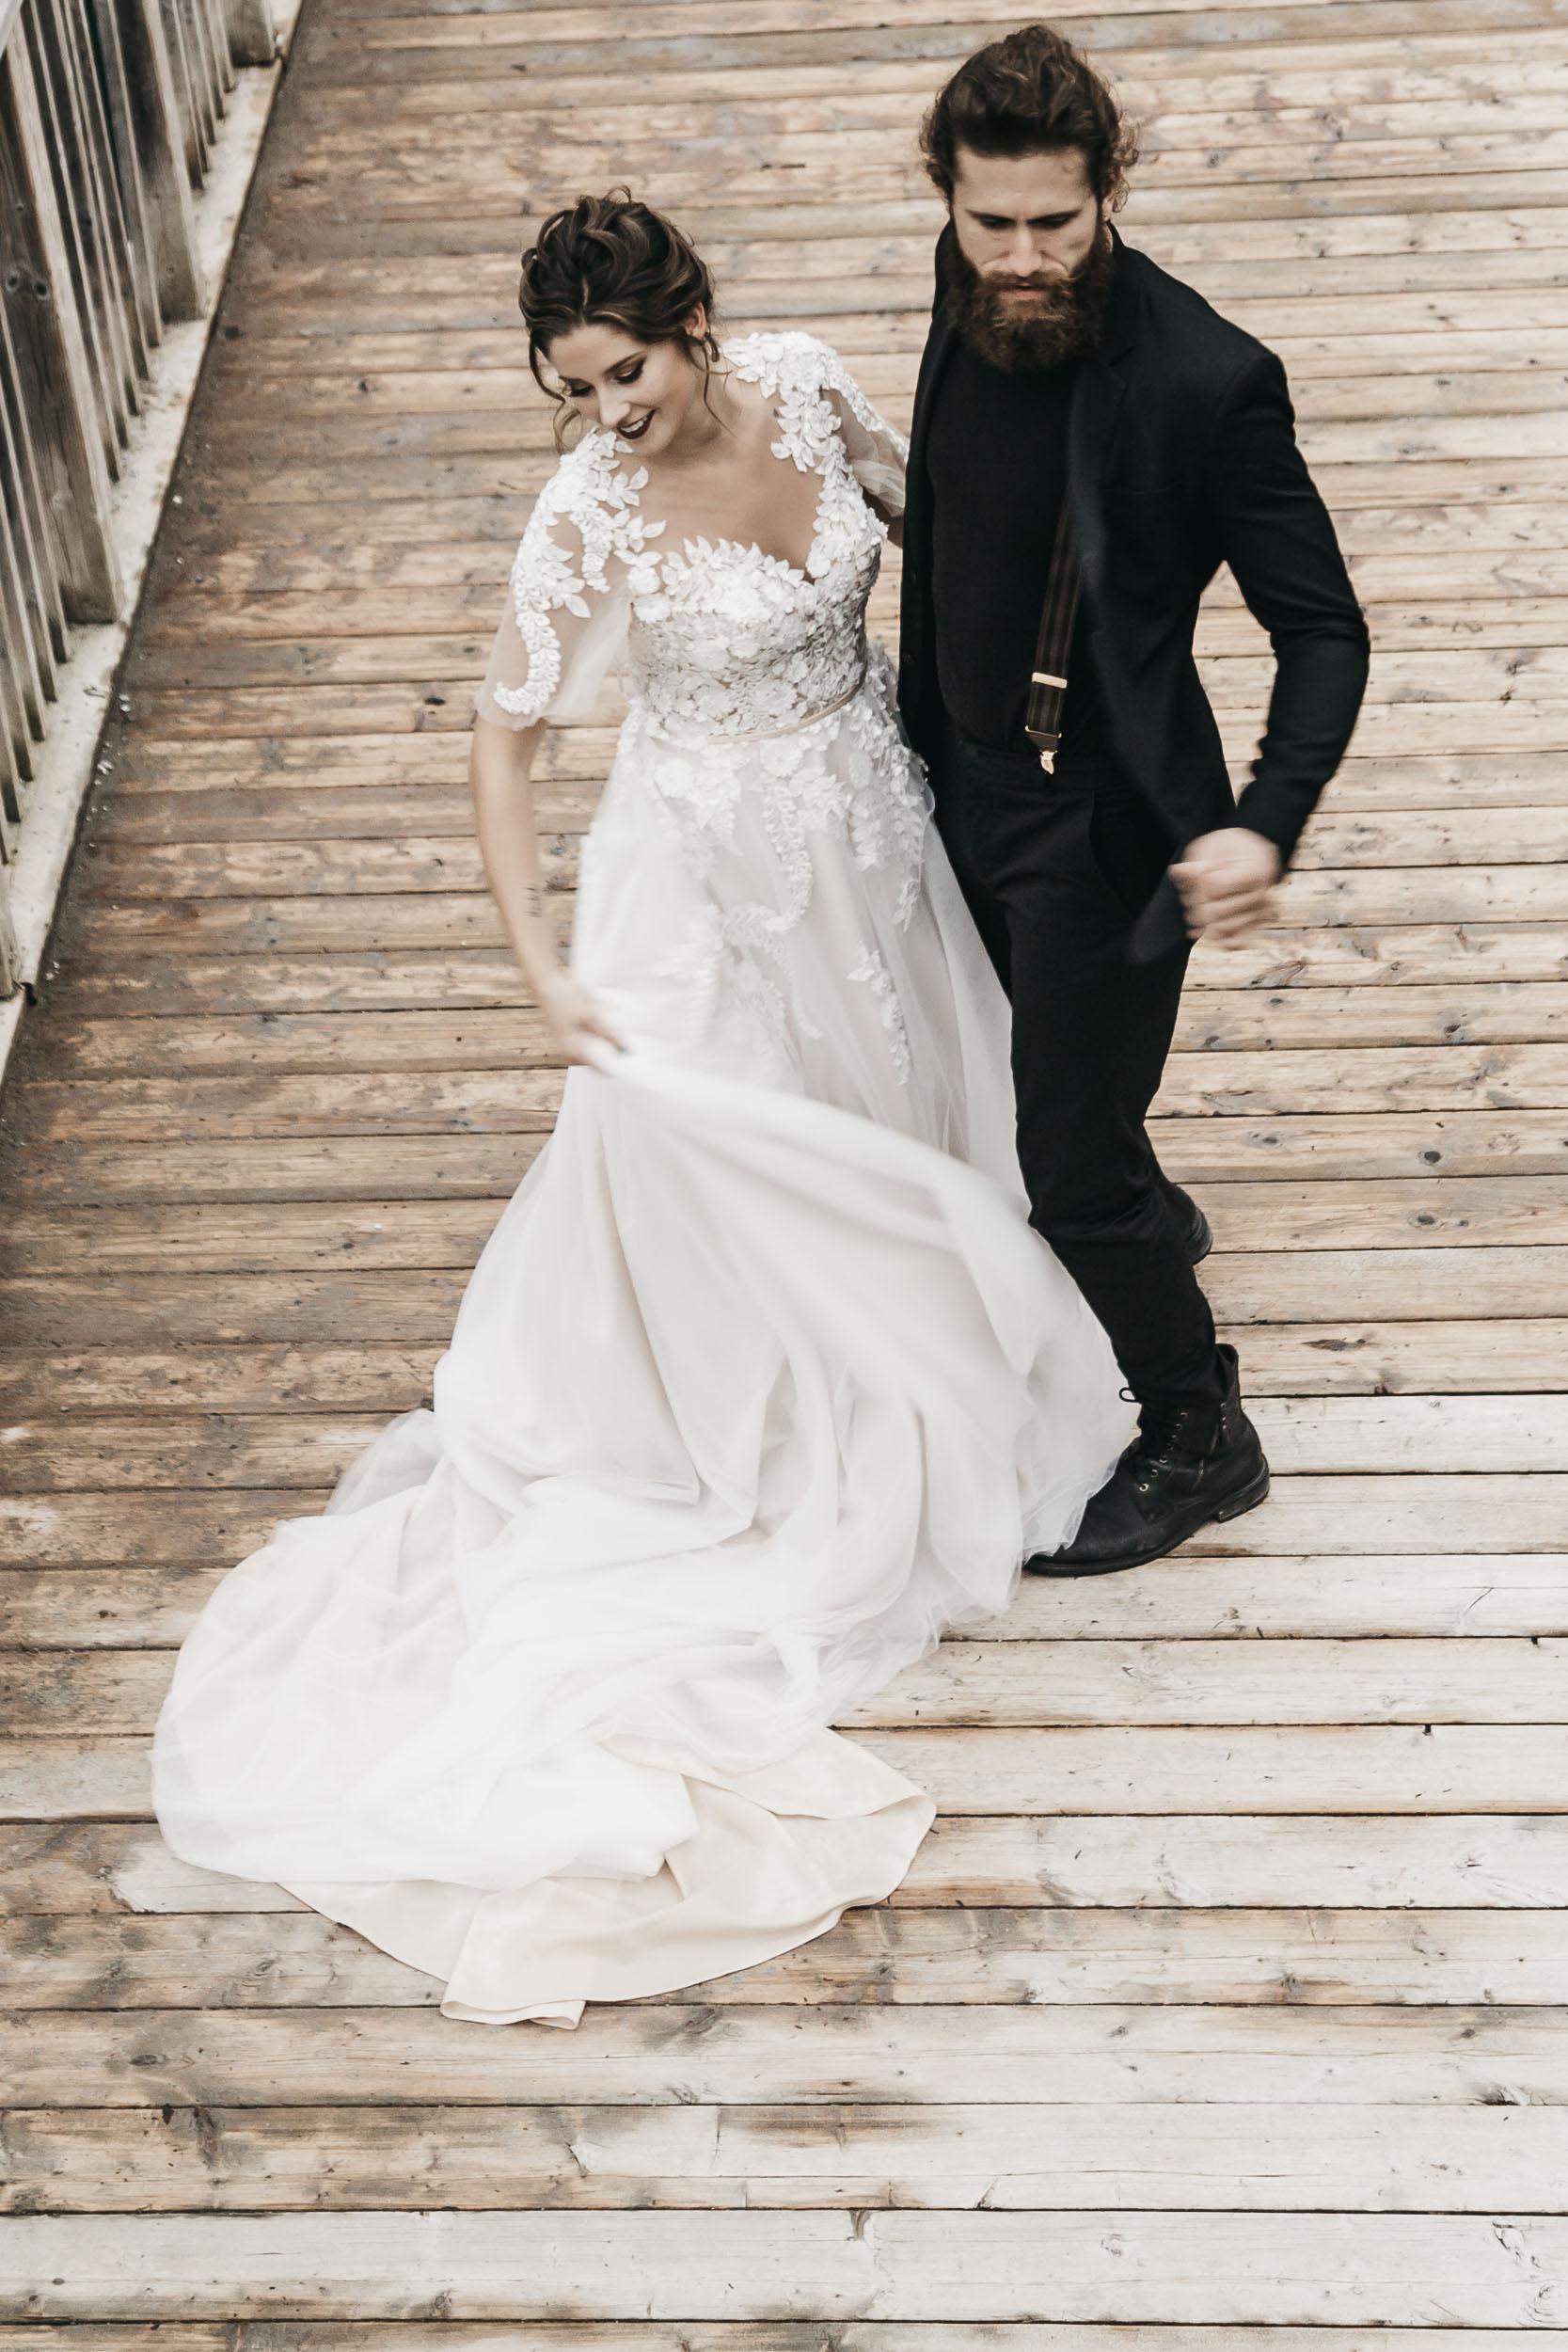 intimate-wedding-elopement-photographer-ottawa-toronto-0039.jpg